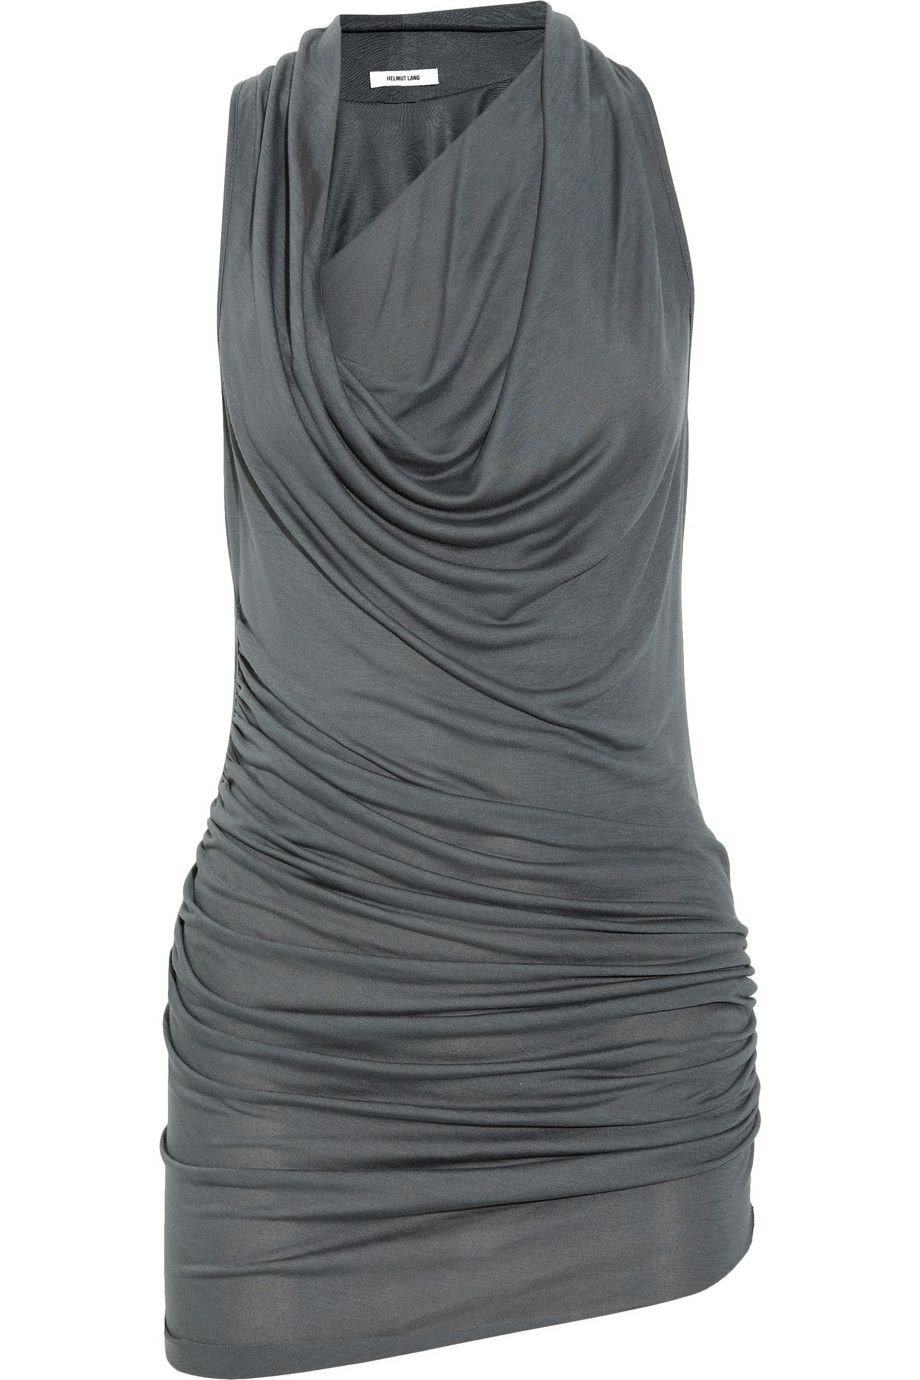 Helmut Lang Scala draped stretch-jersey top NET-A-PORTER.COM